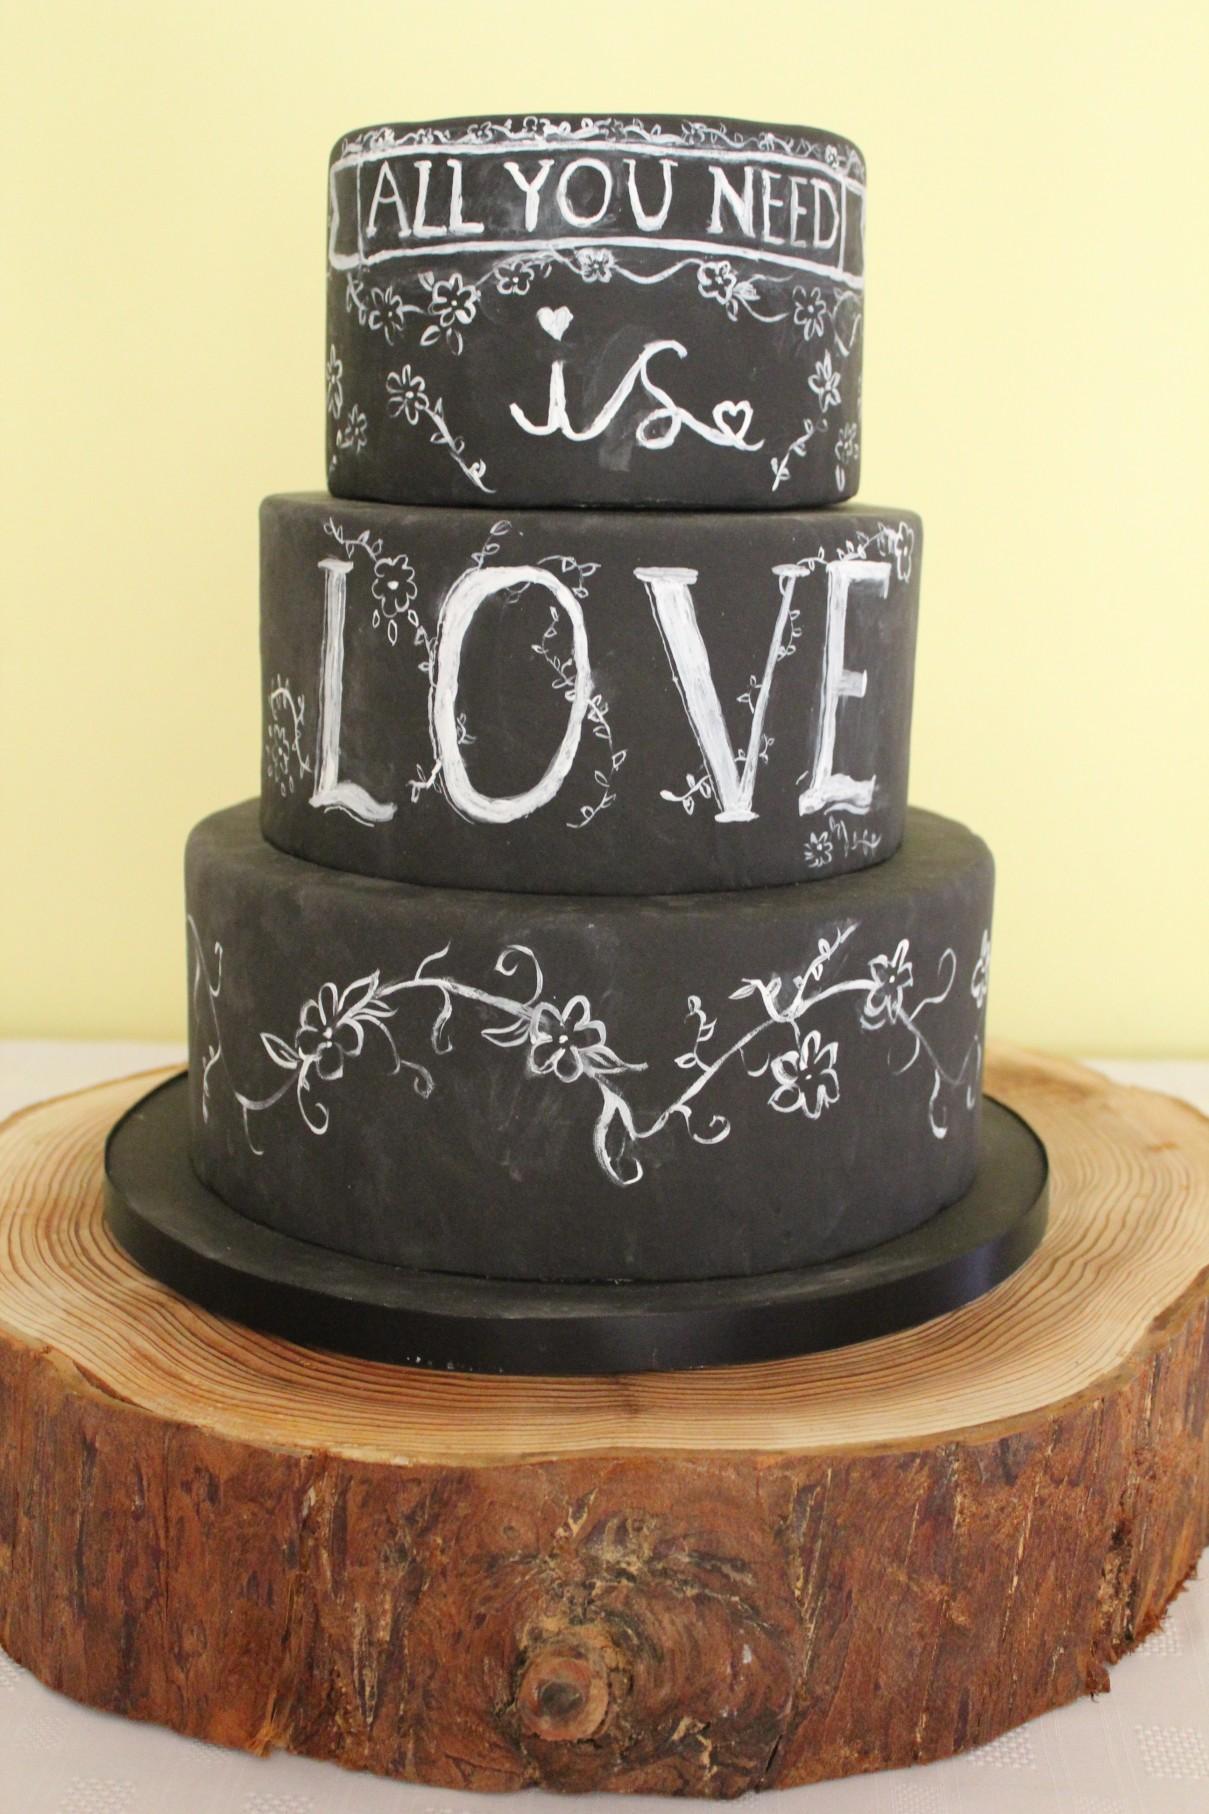 Happy yellow cake company - chalkbord wedding cake - unique wedding cakes 1 (1)